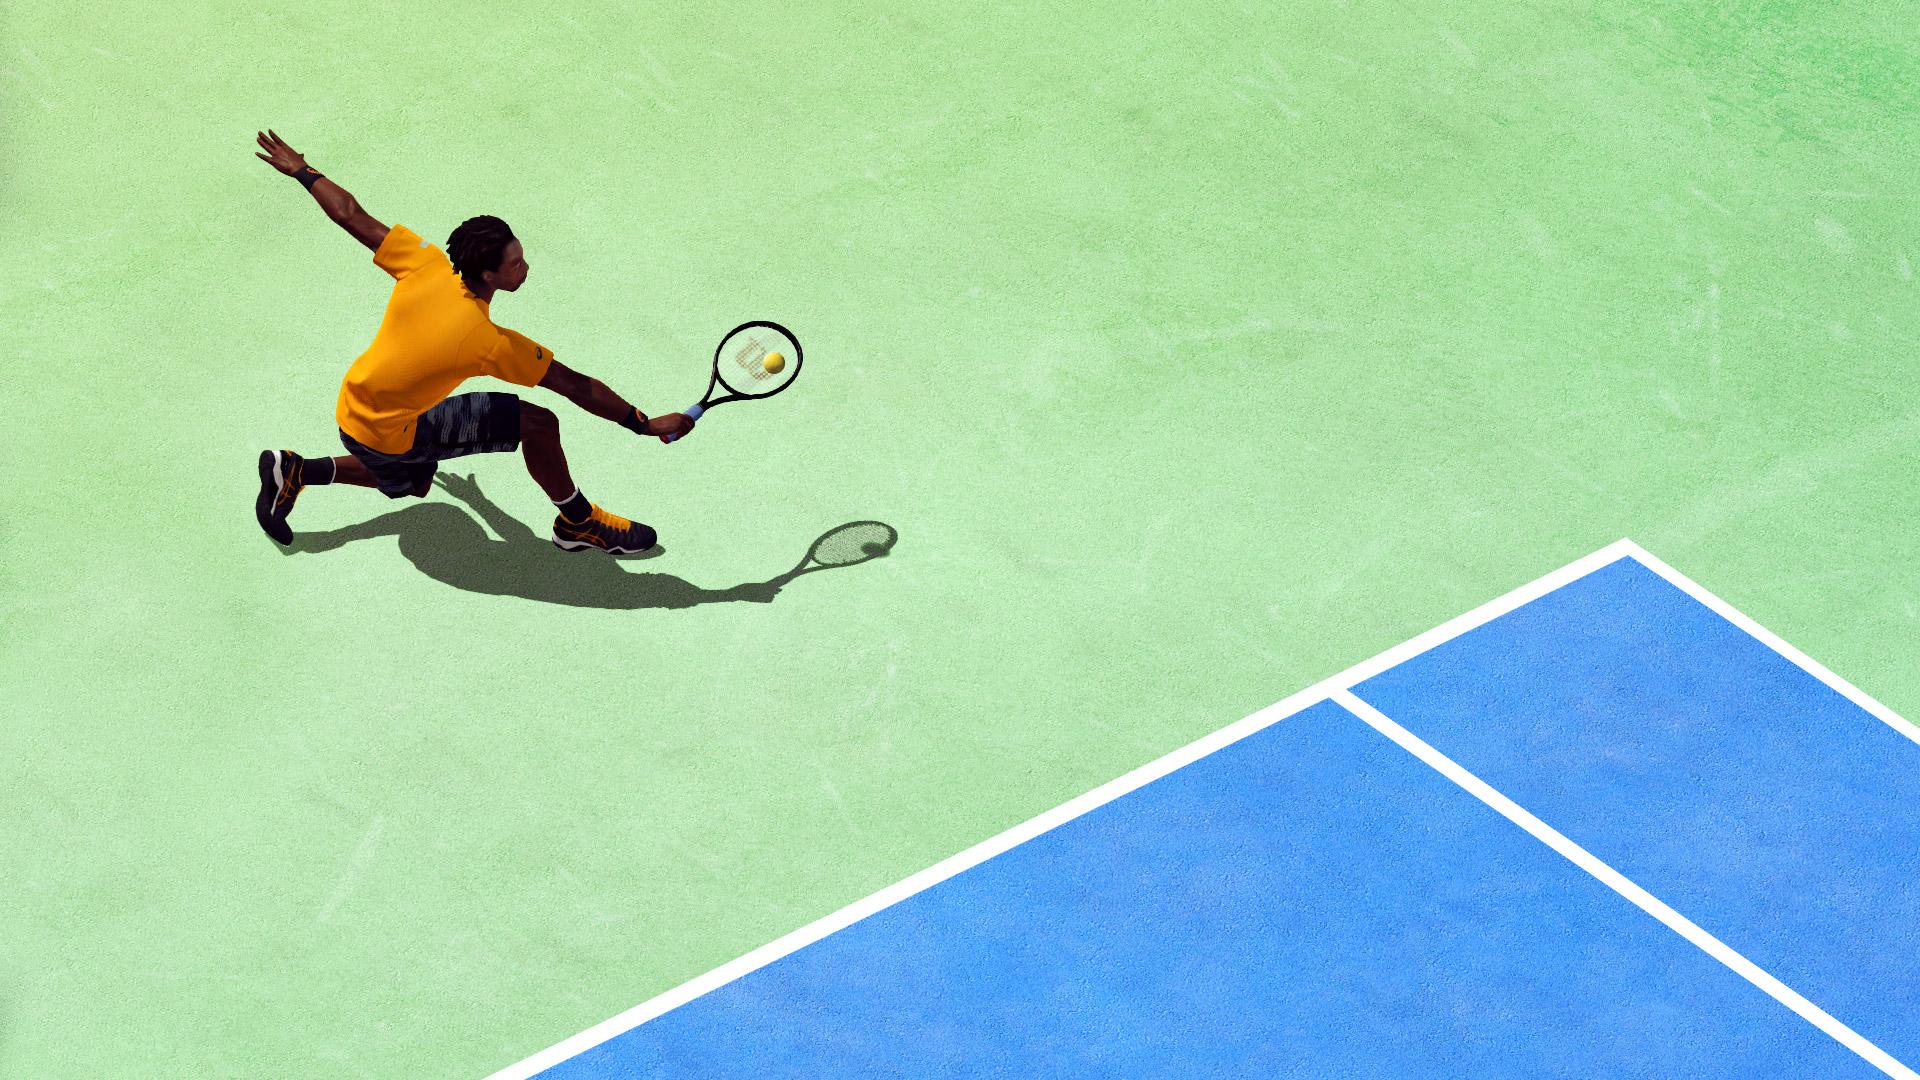 Tennis World Tour Wallpaper in 1920x1080